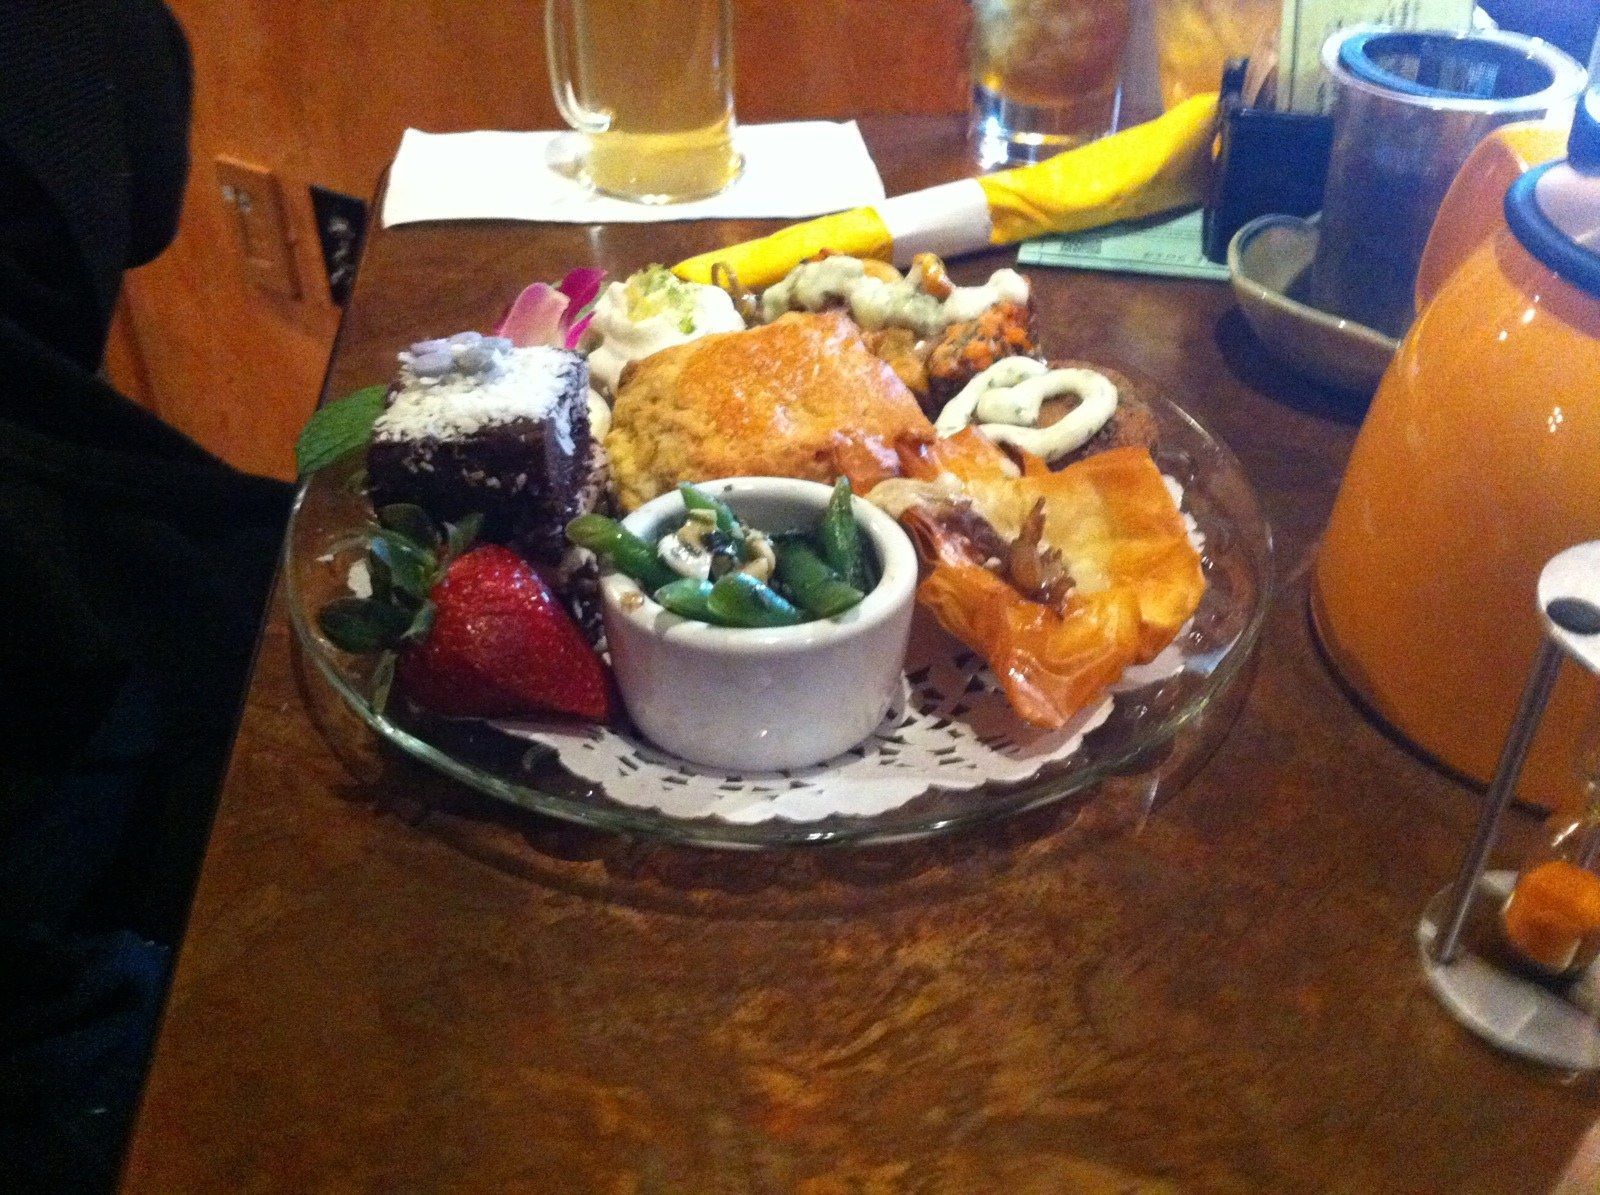 Pin by The Tea Zone & Camellia Lounge on Tea! | Pinterest